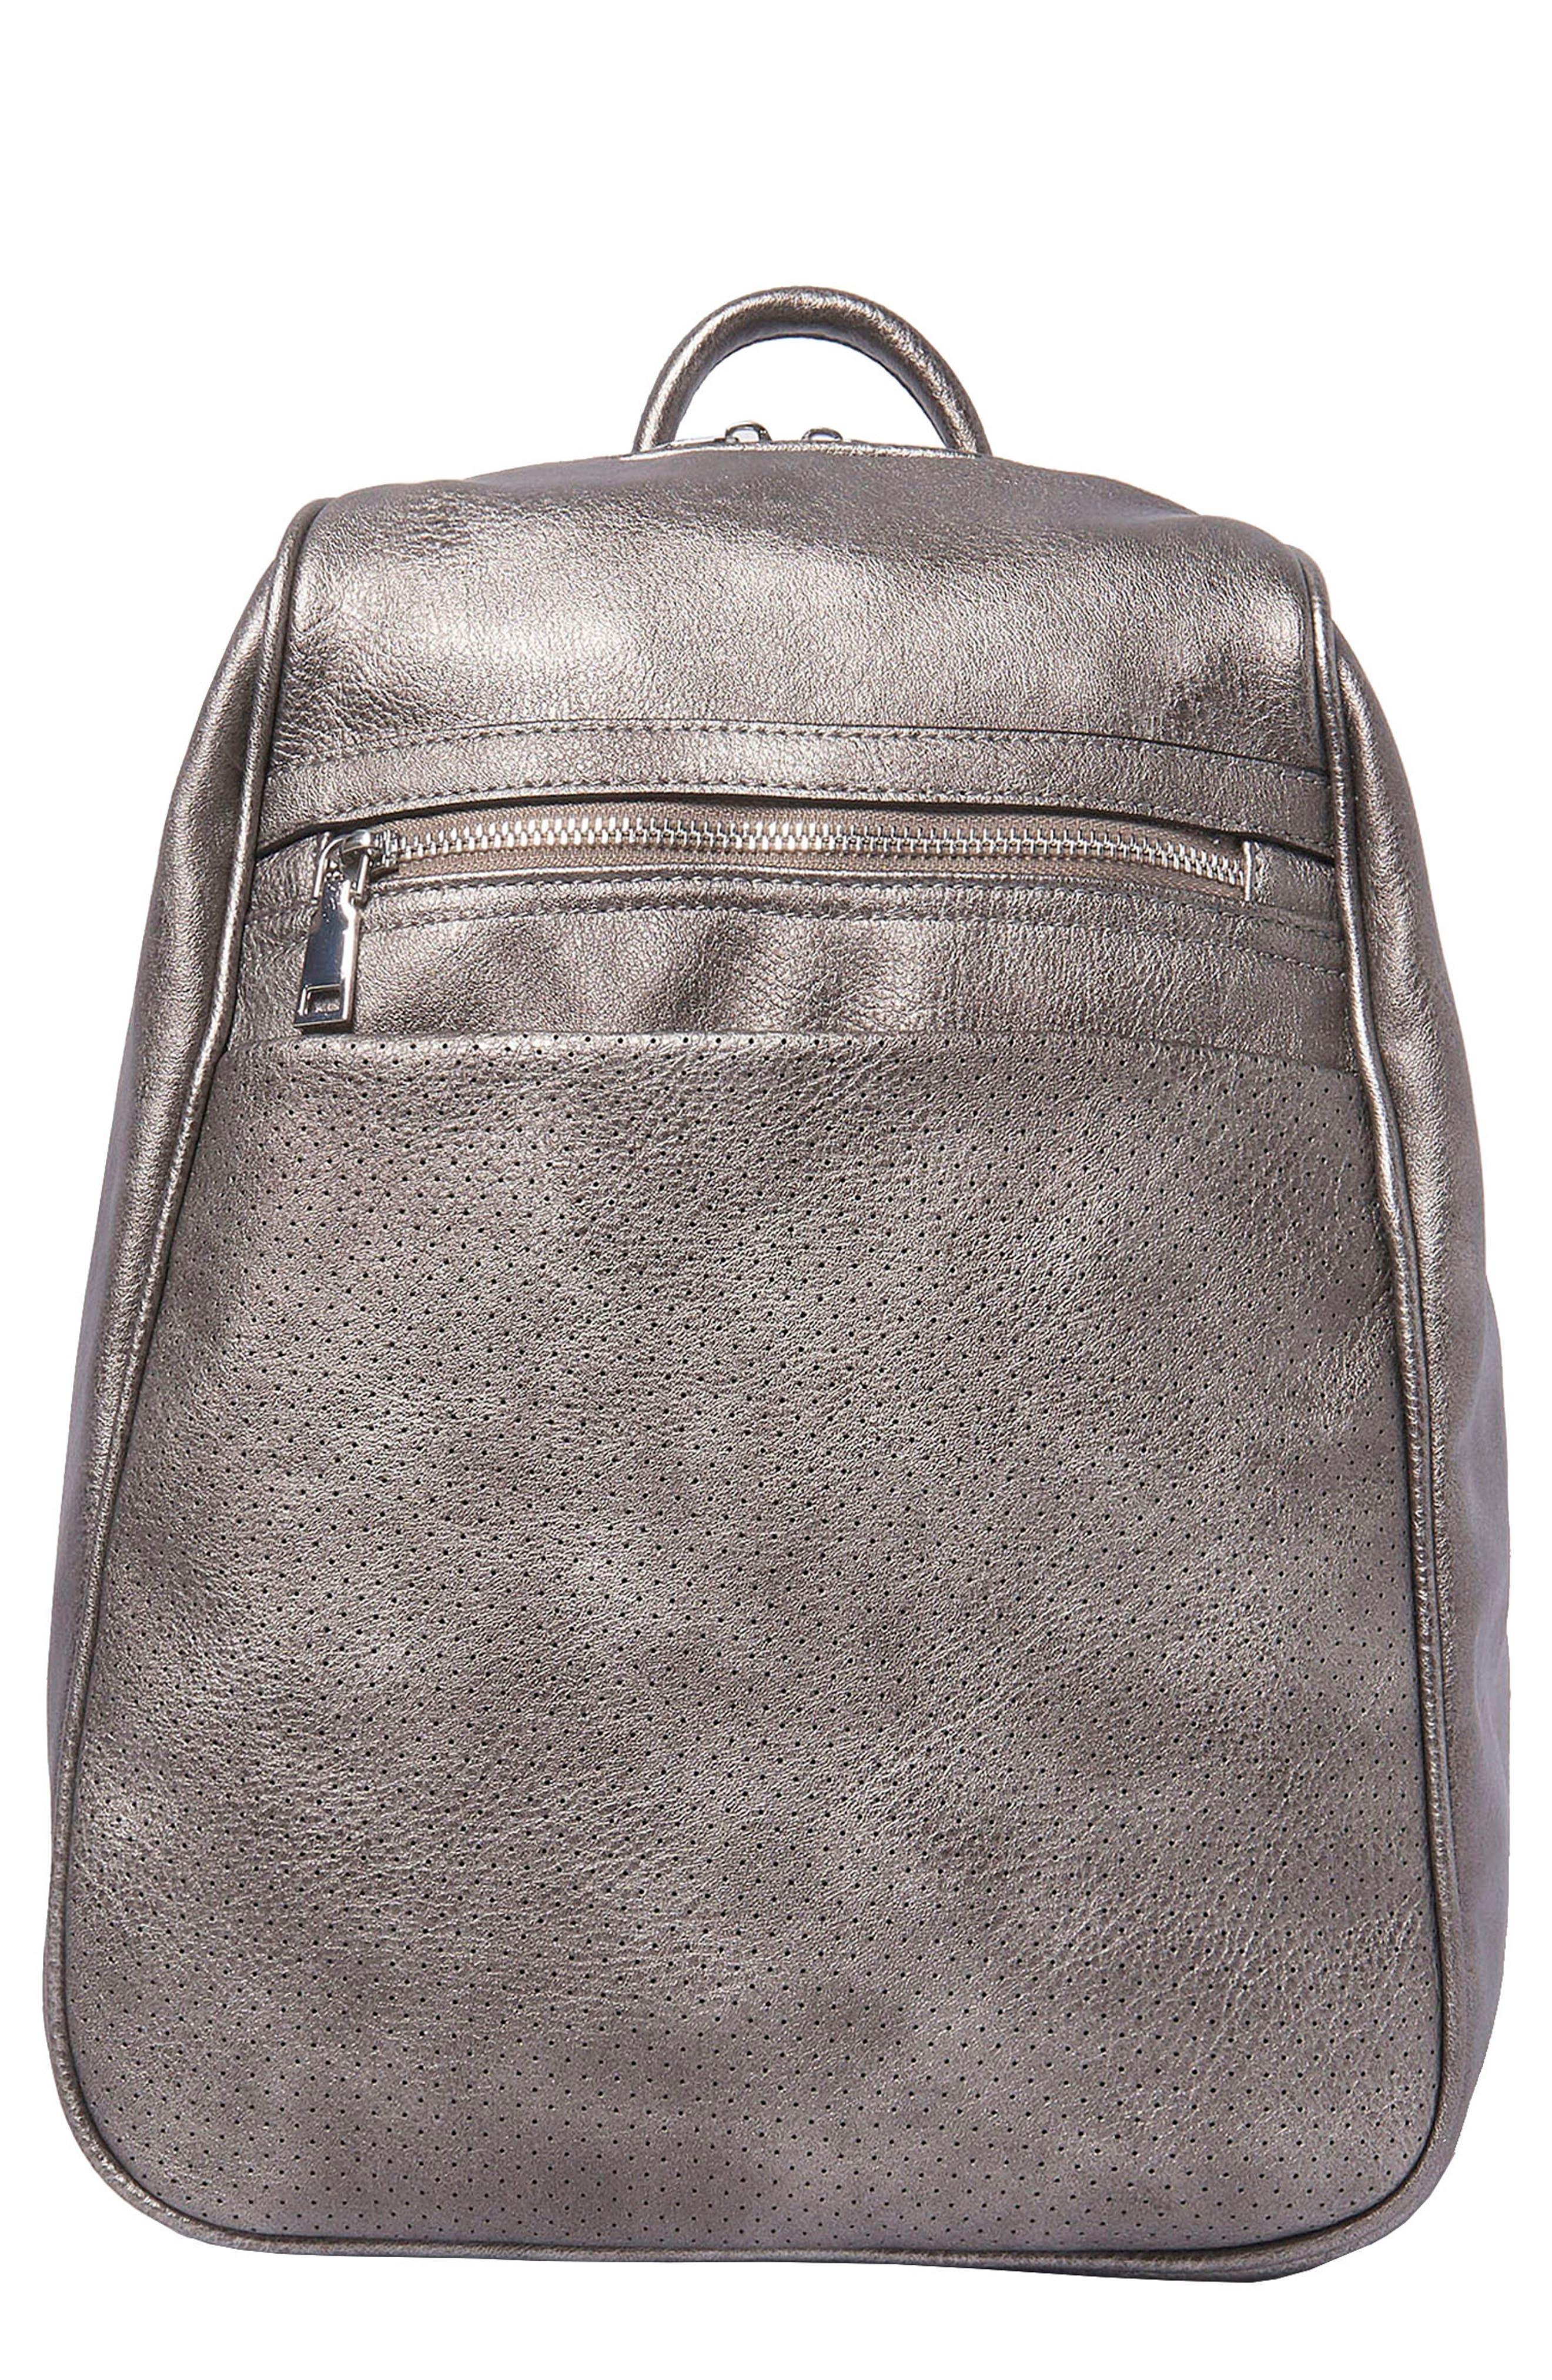 Dream On Vegan Leather Backpack - Metallic in Dark Silver